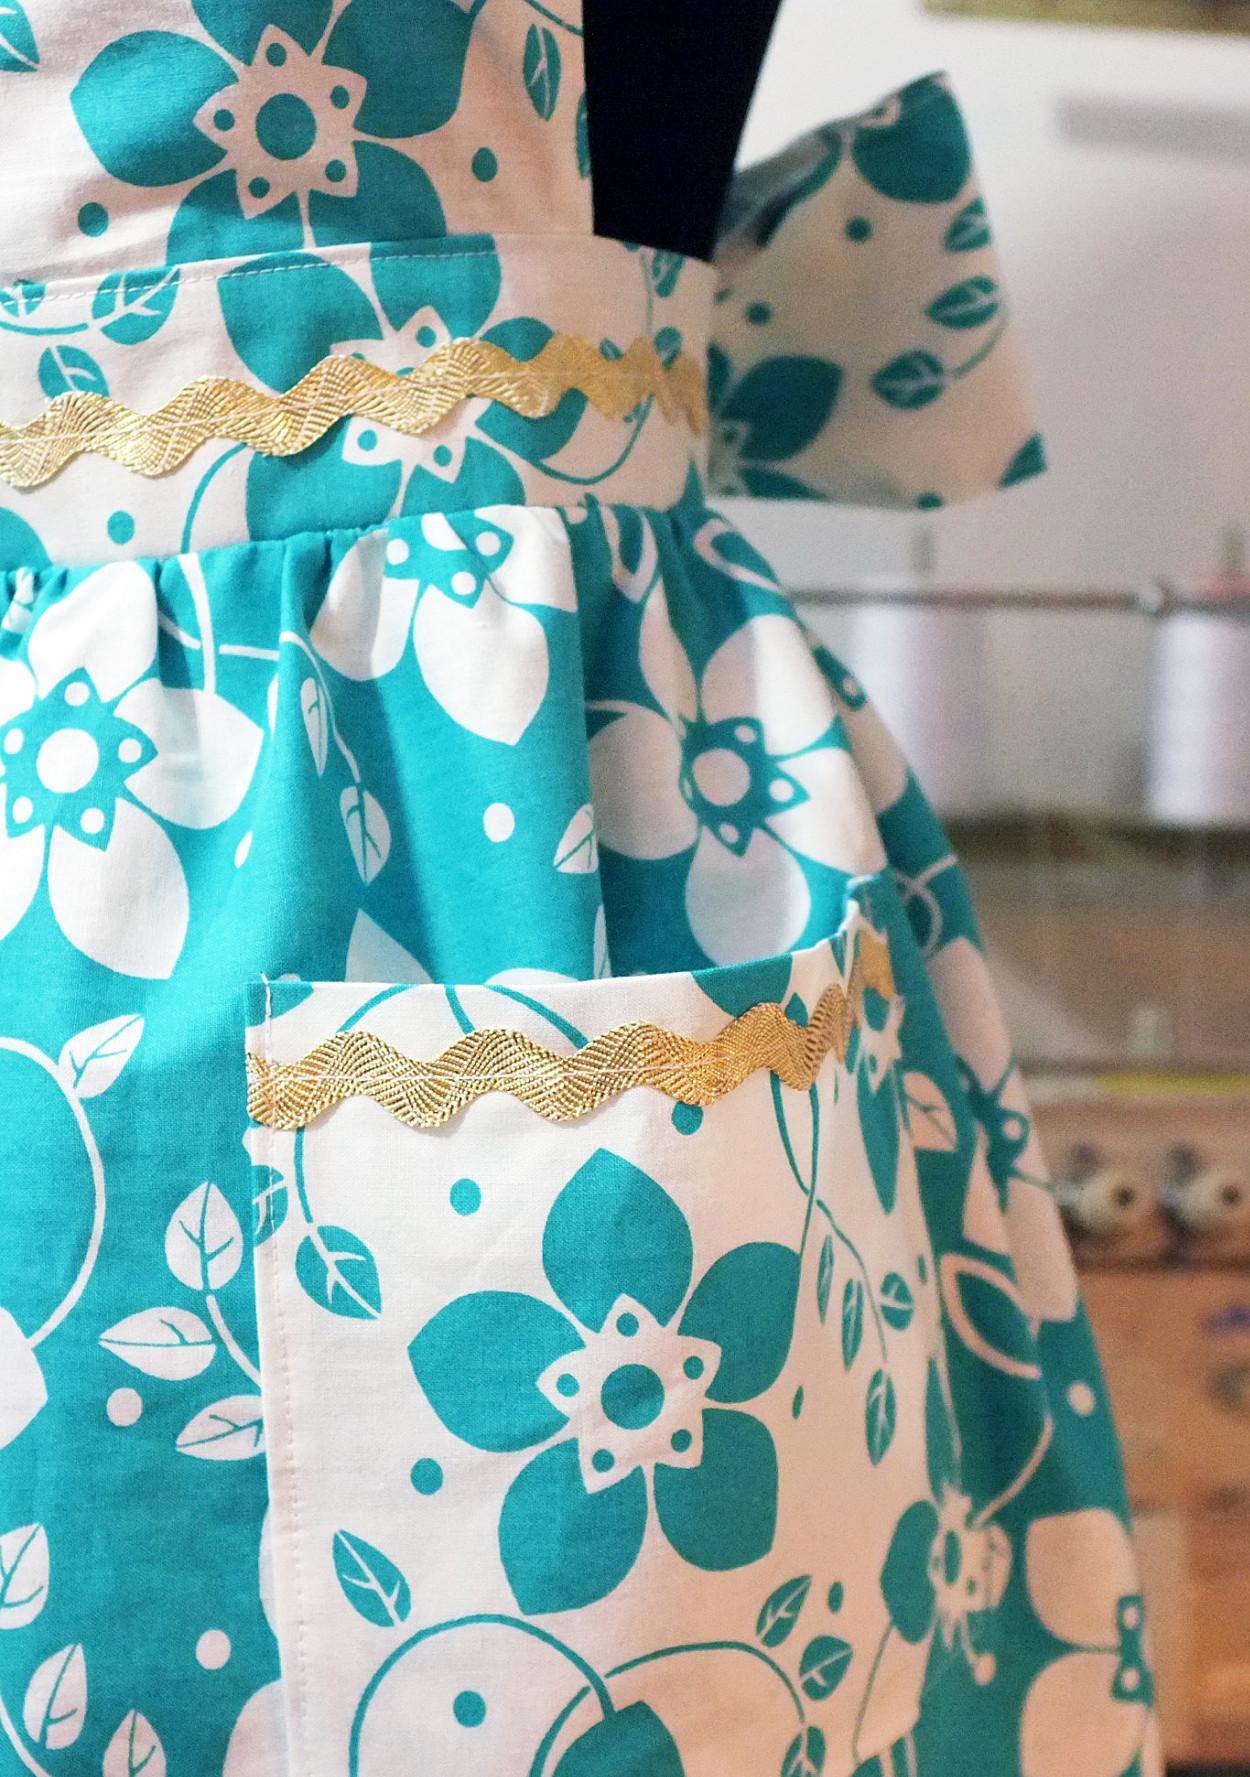 How to Sew Your Own VintageInspired Apron  Martha Stewart